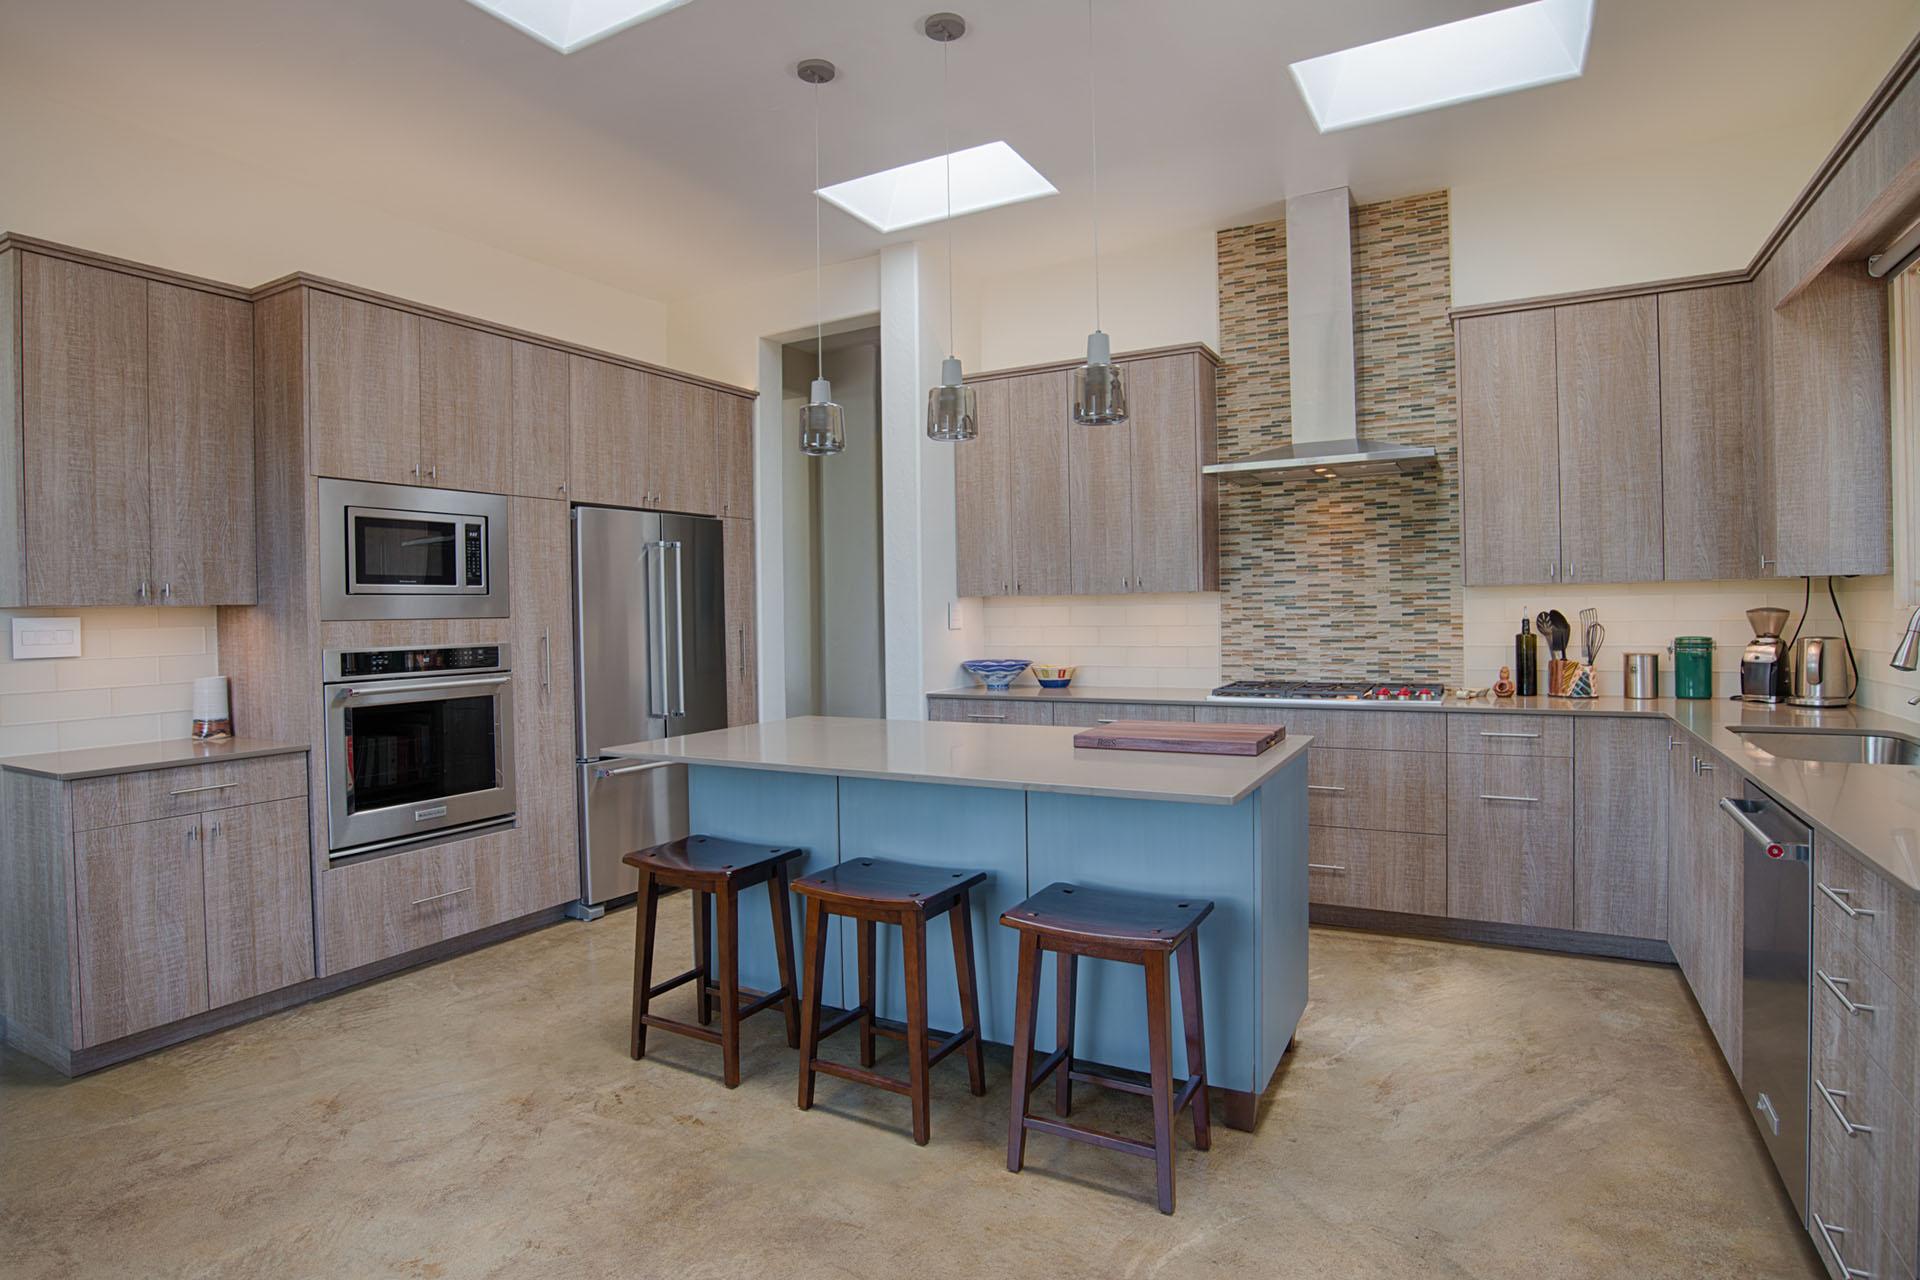 Douglas Maah Construction, kitchen remodeling in Santa Fe, NM